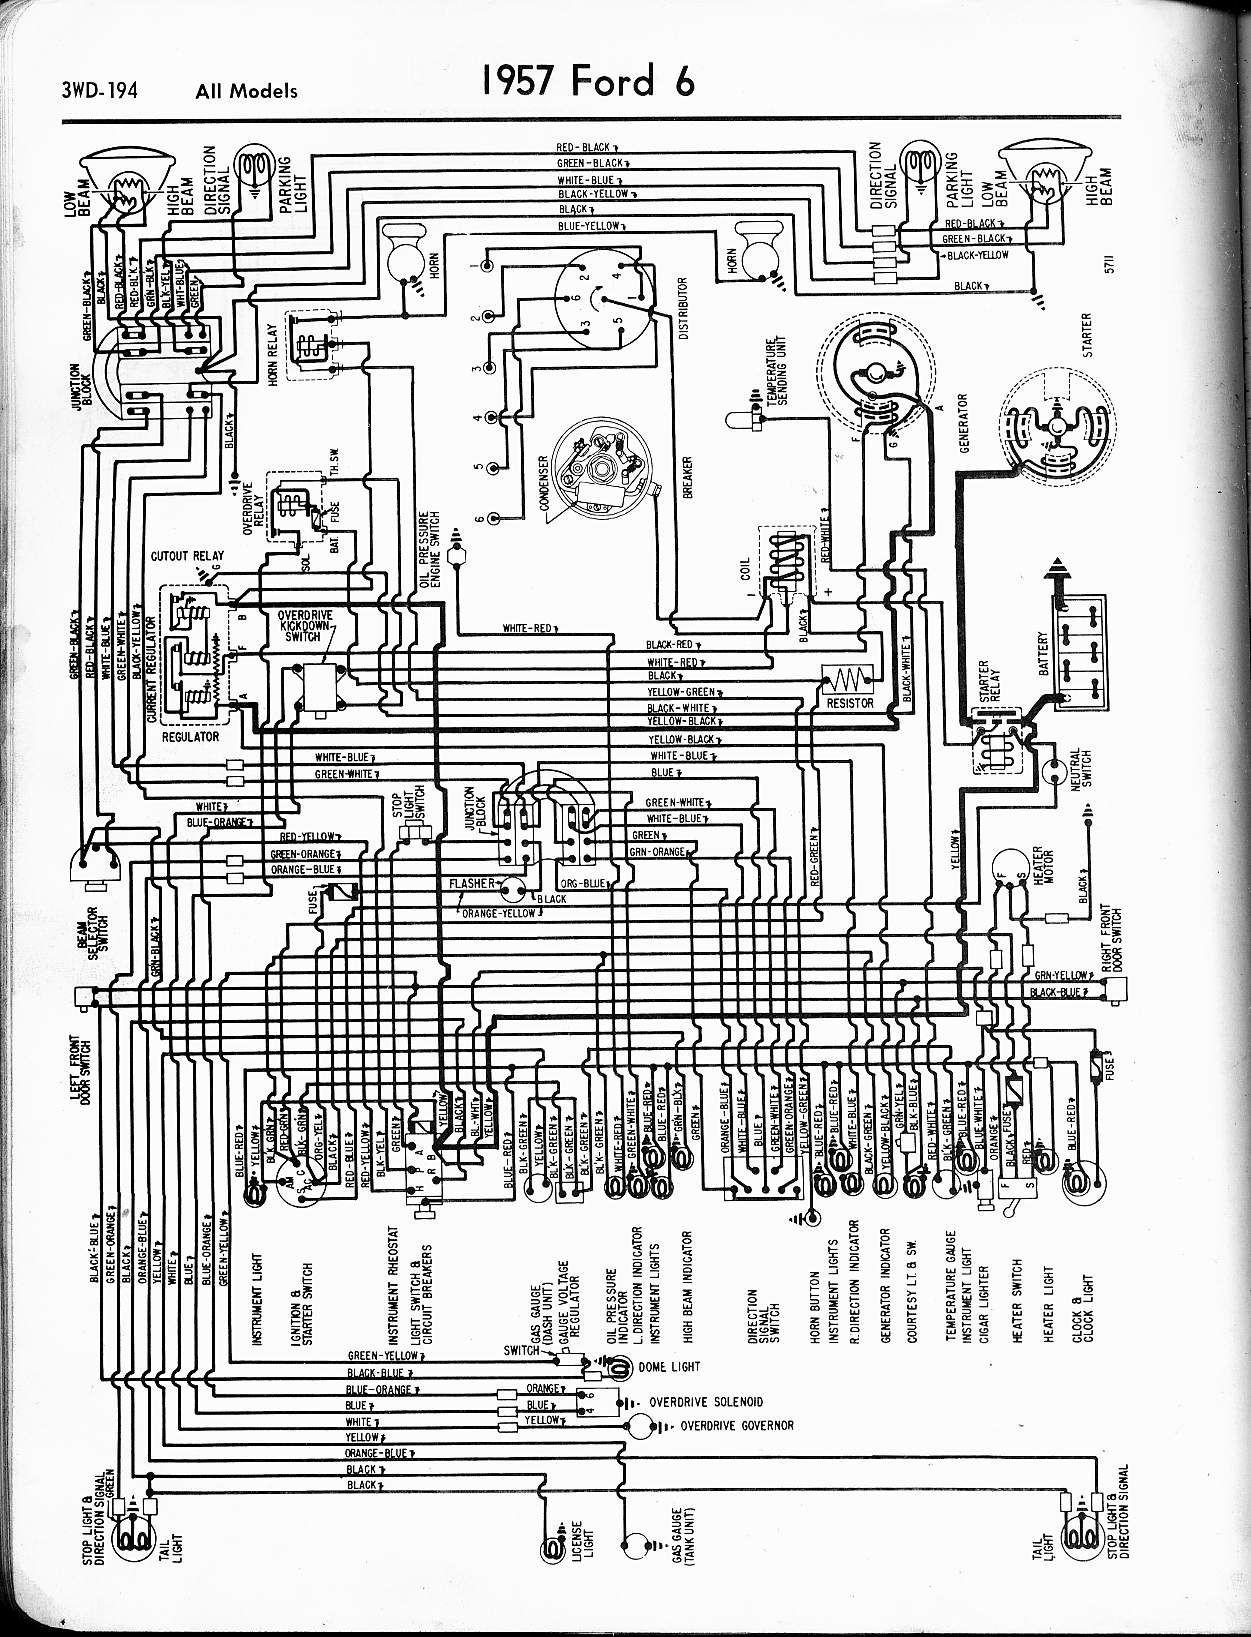 Ba Falcon Engine Diagram 57 65 ford Wiring Diagrams – My Wiring DIagram